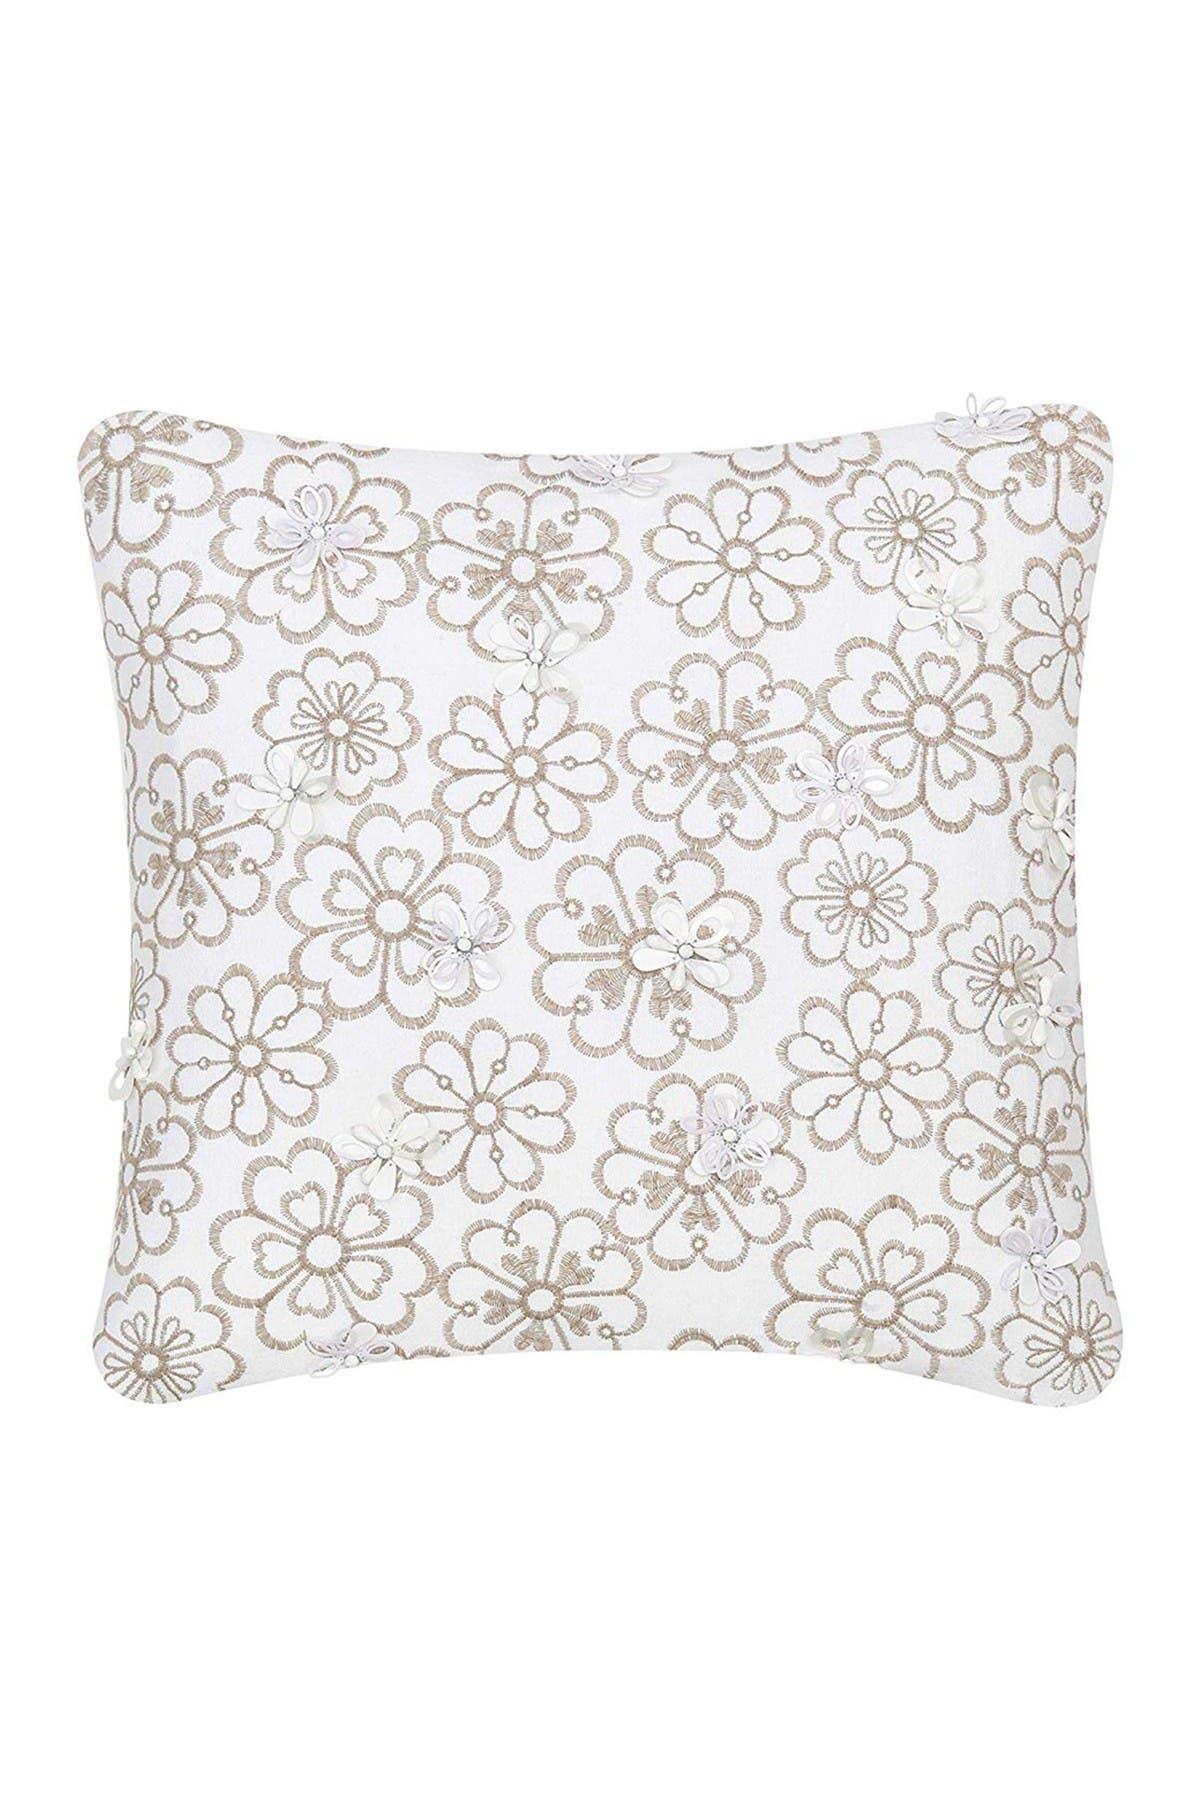 "Image of kate spade new york white heart garden decorative pillow - 18"" x 18"""